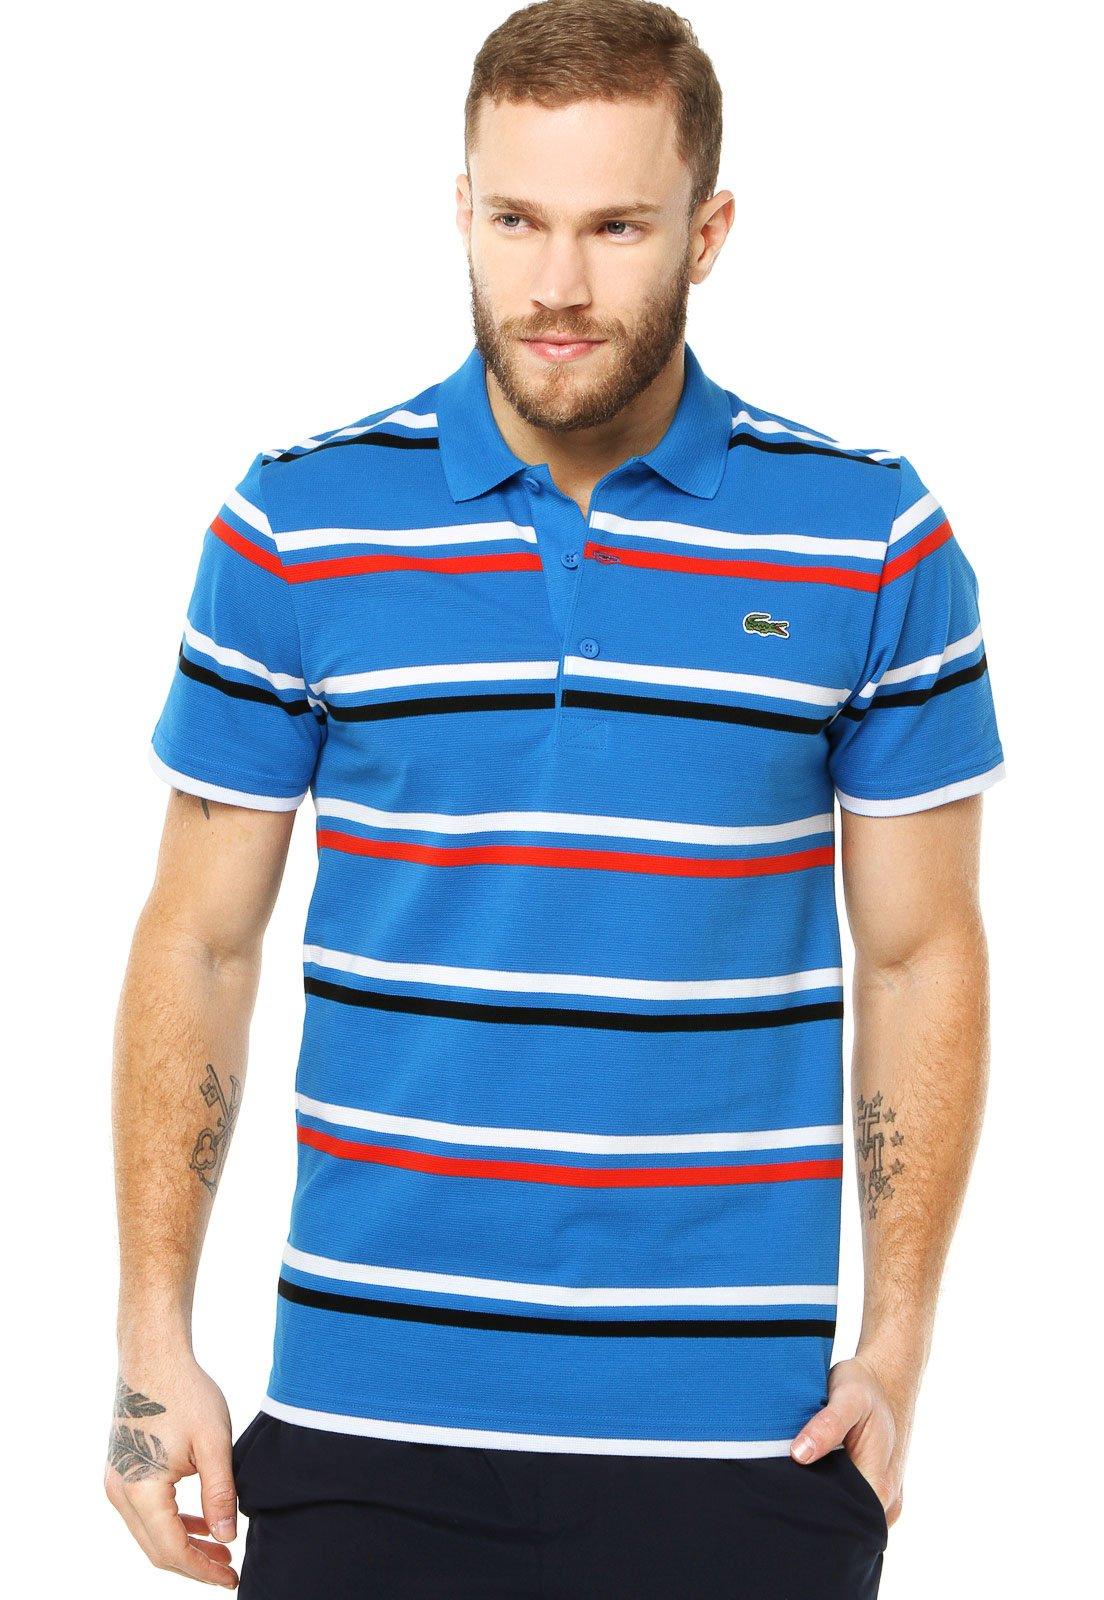 camiseta lacoste listrada 2cf3535d67